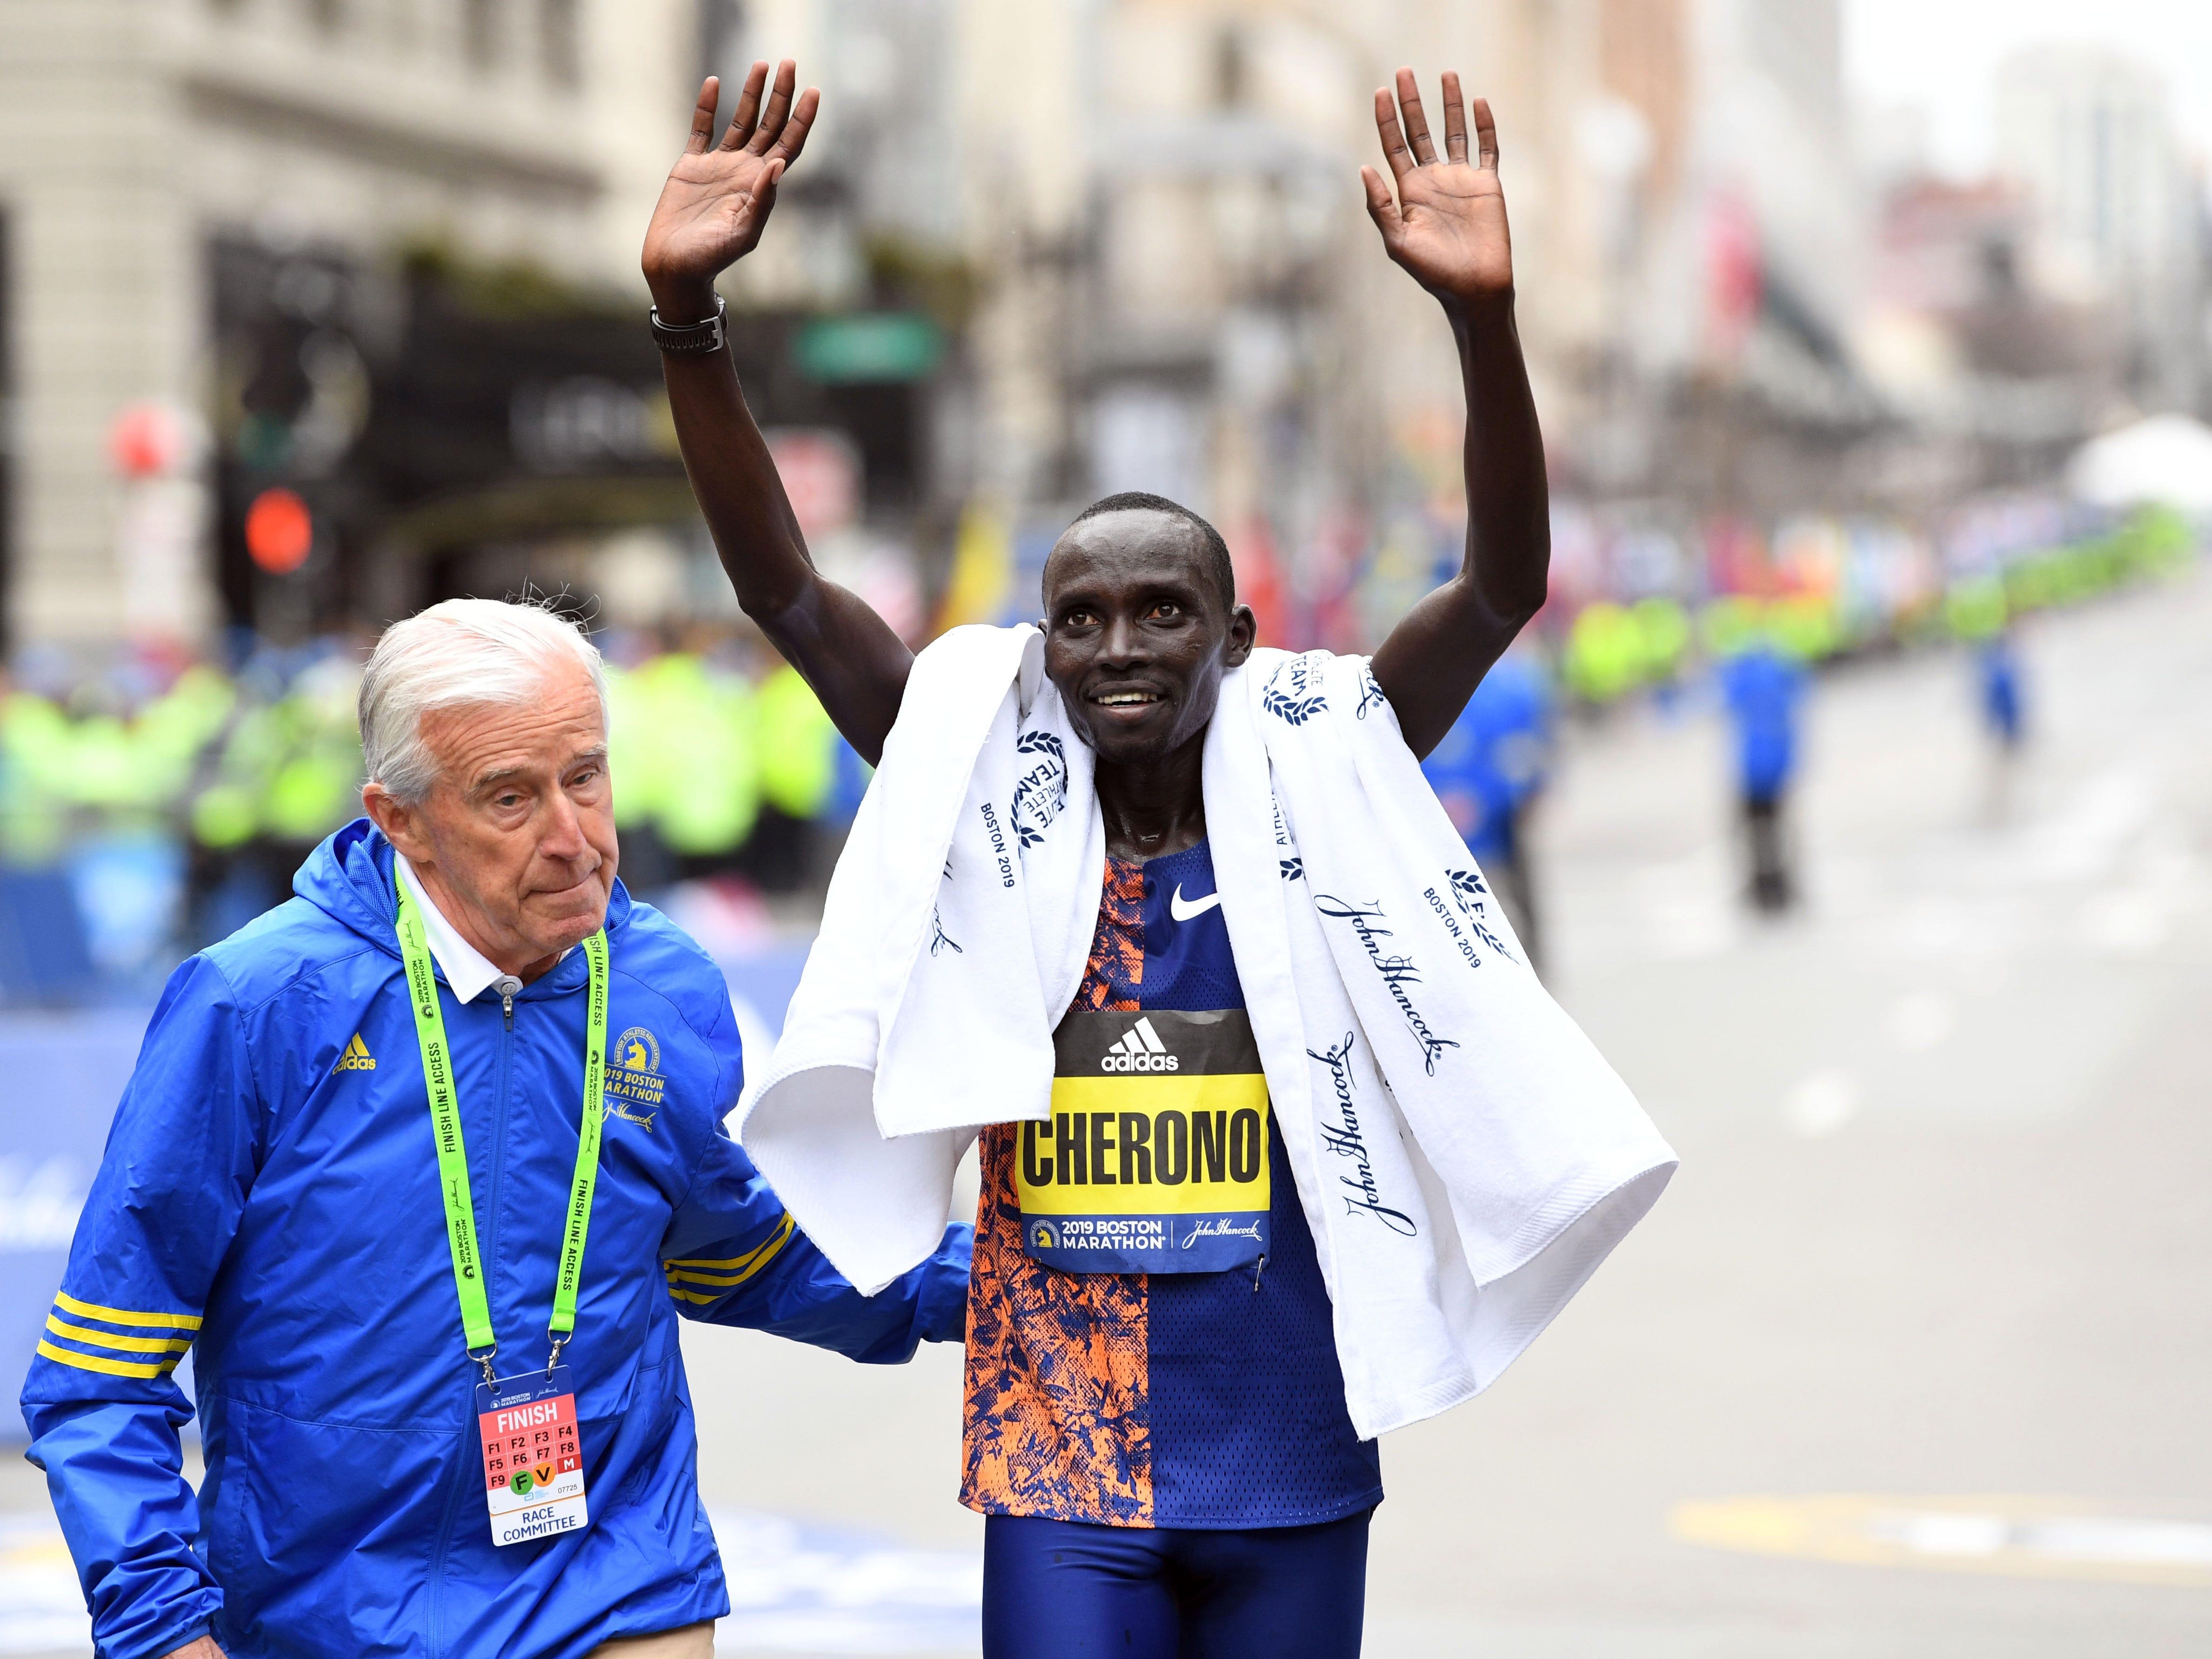 Lawrence Cherono (KEN) reacts after winning the 2019 Boston Marathon.